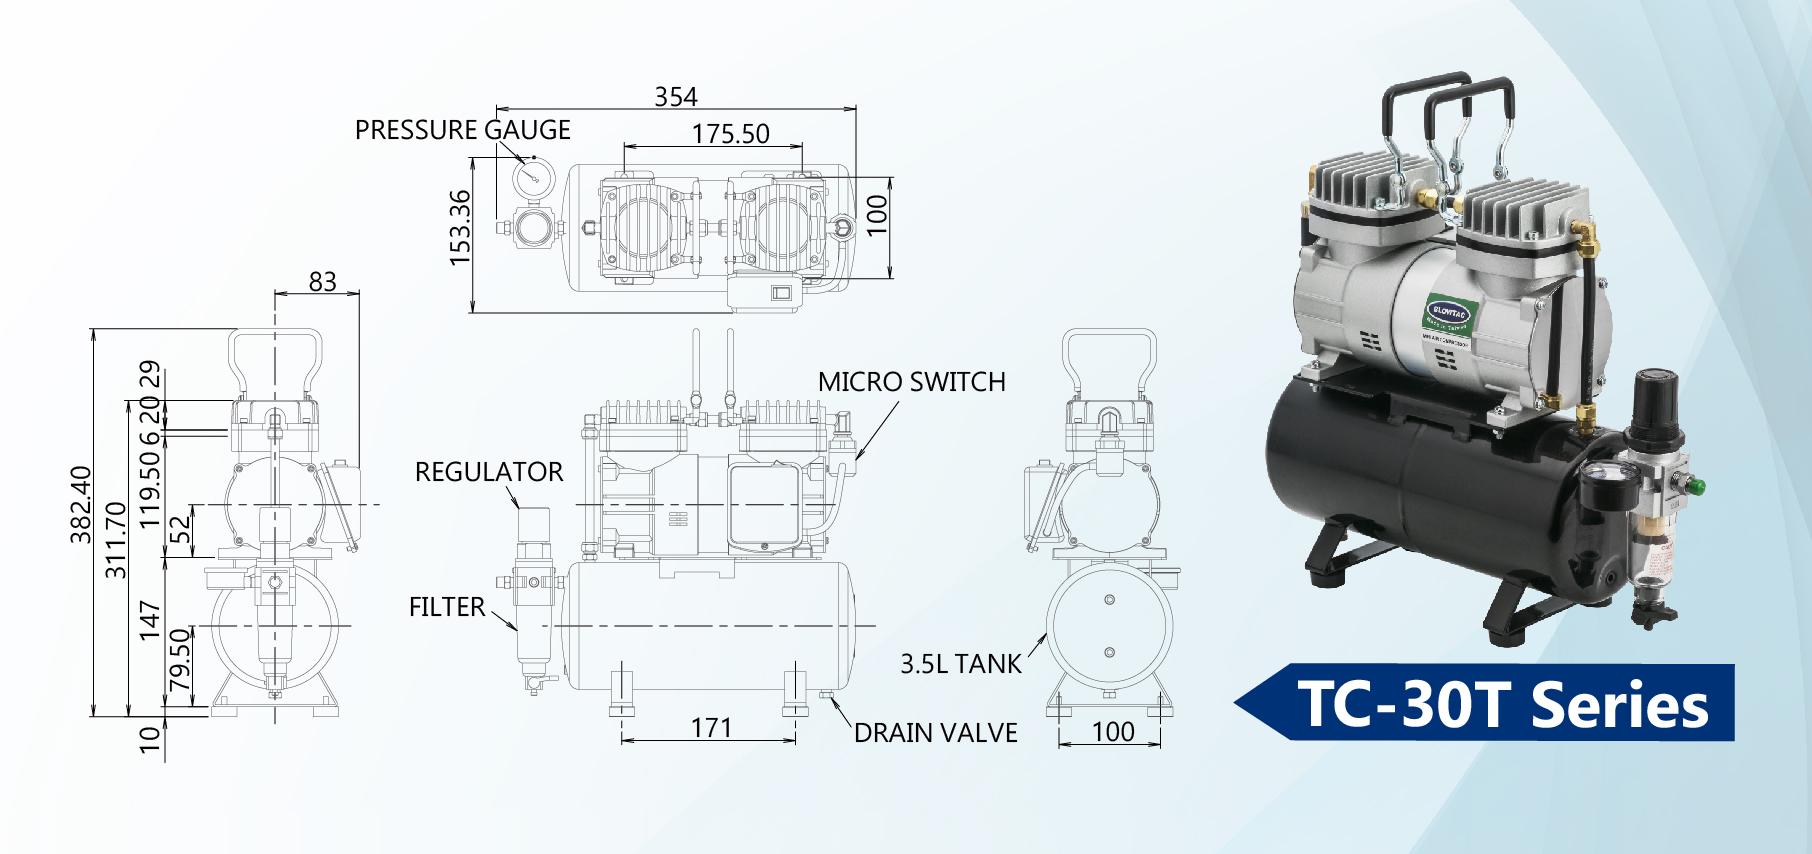 TC-30T Series Mini Air Compressors Dimension